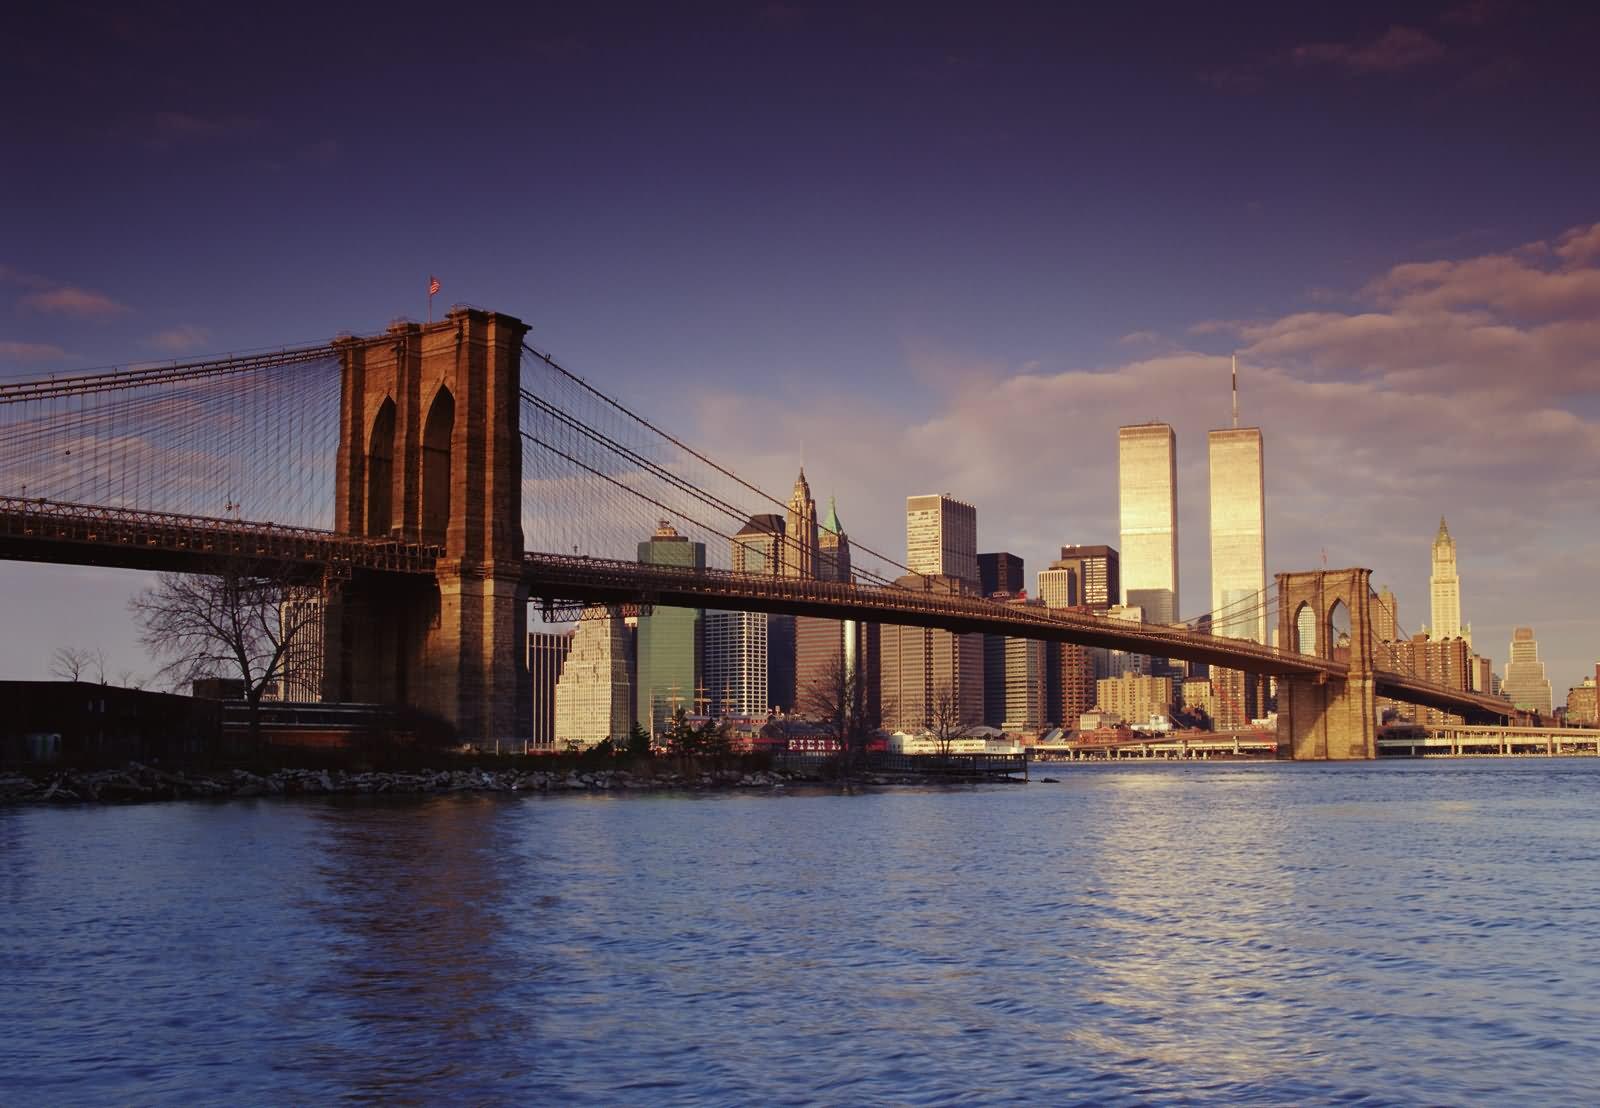 Amazing side view of brooklyn bridge malvernweather Choice Image